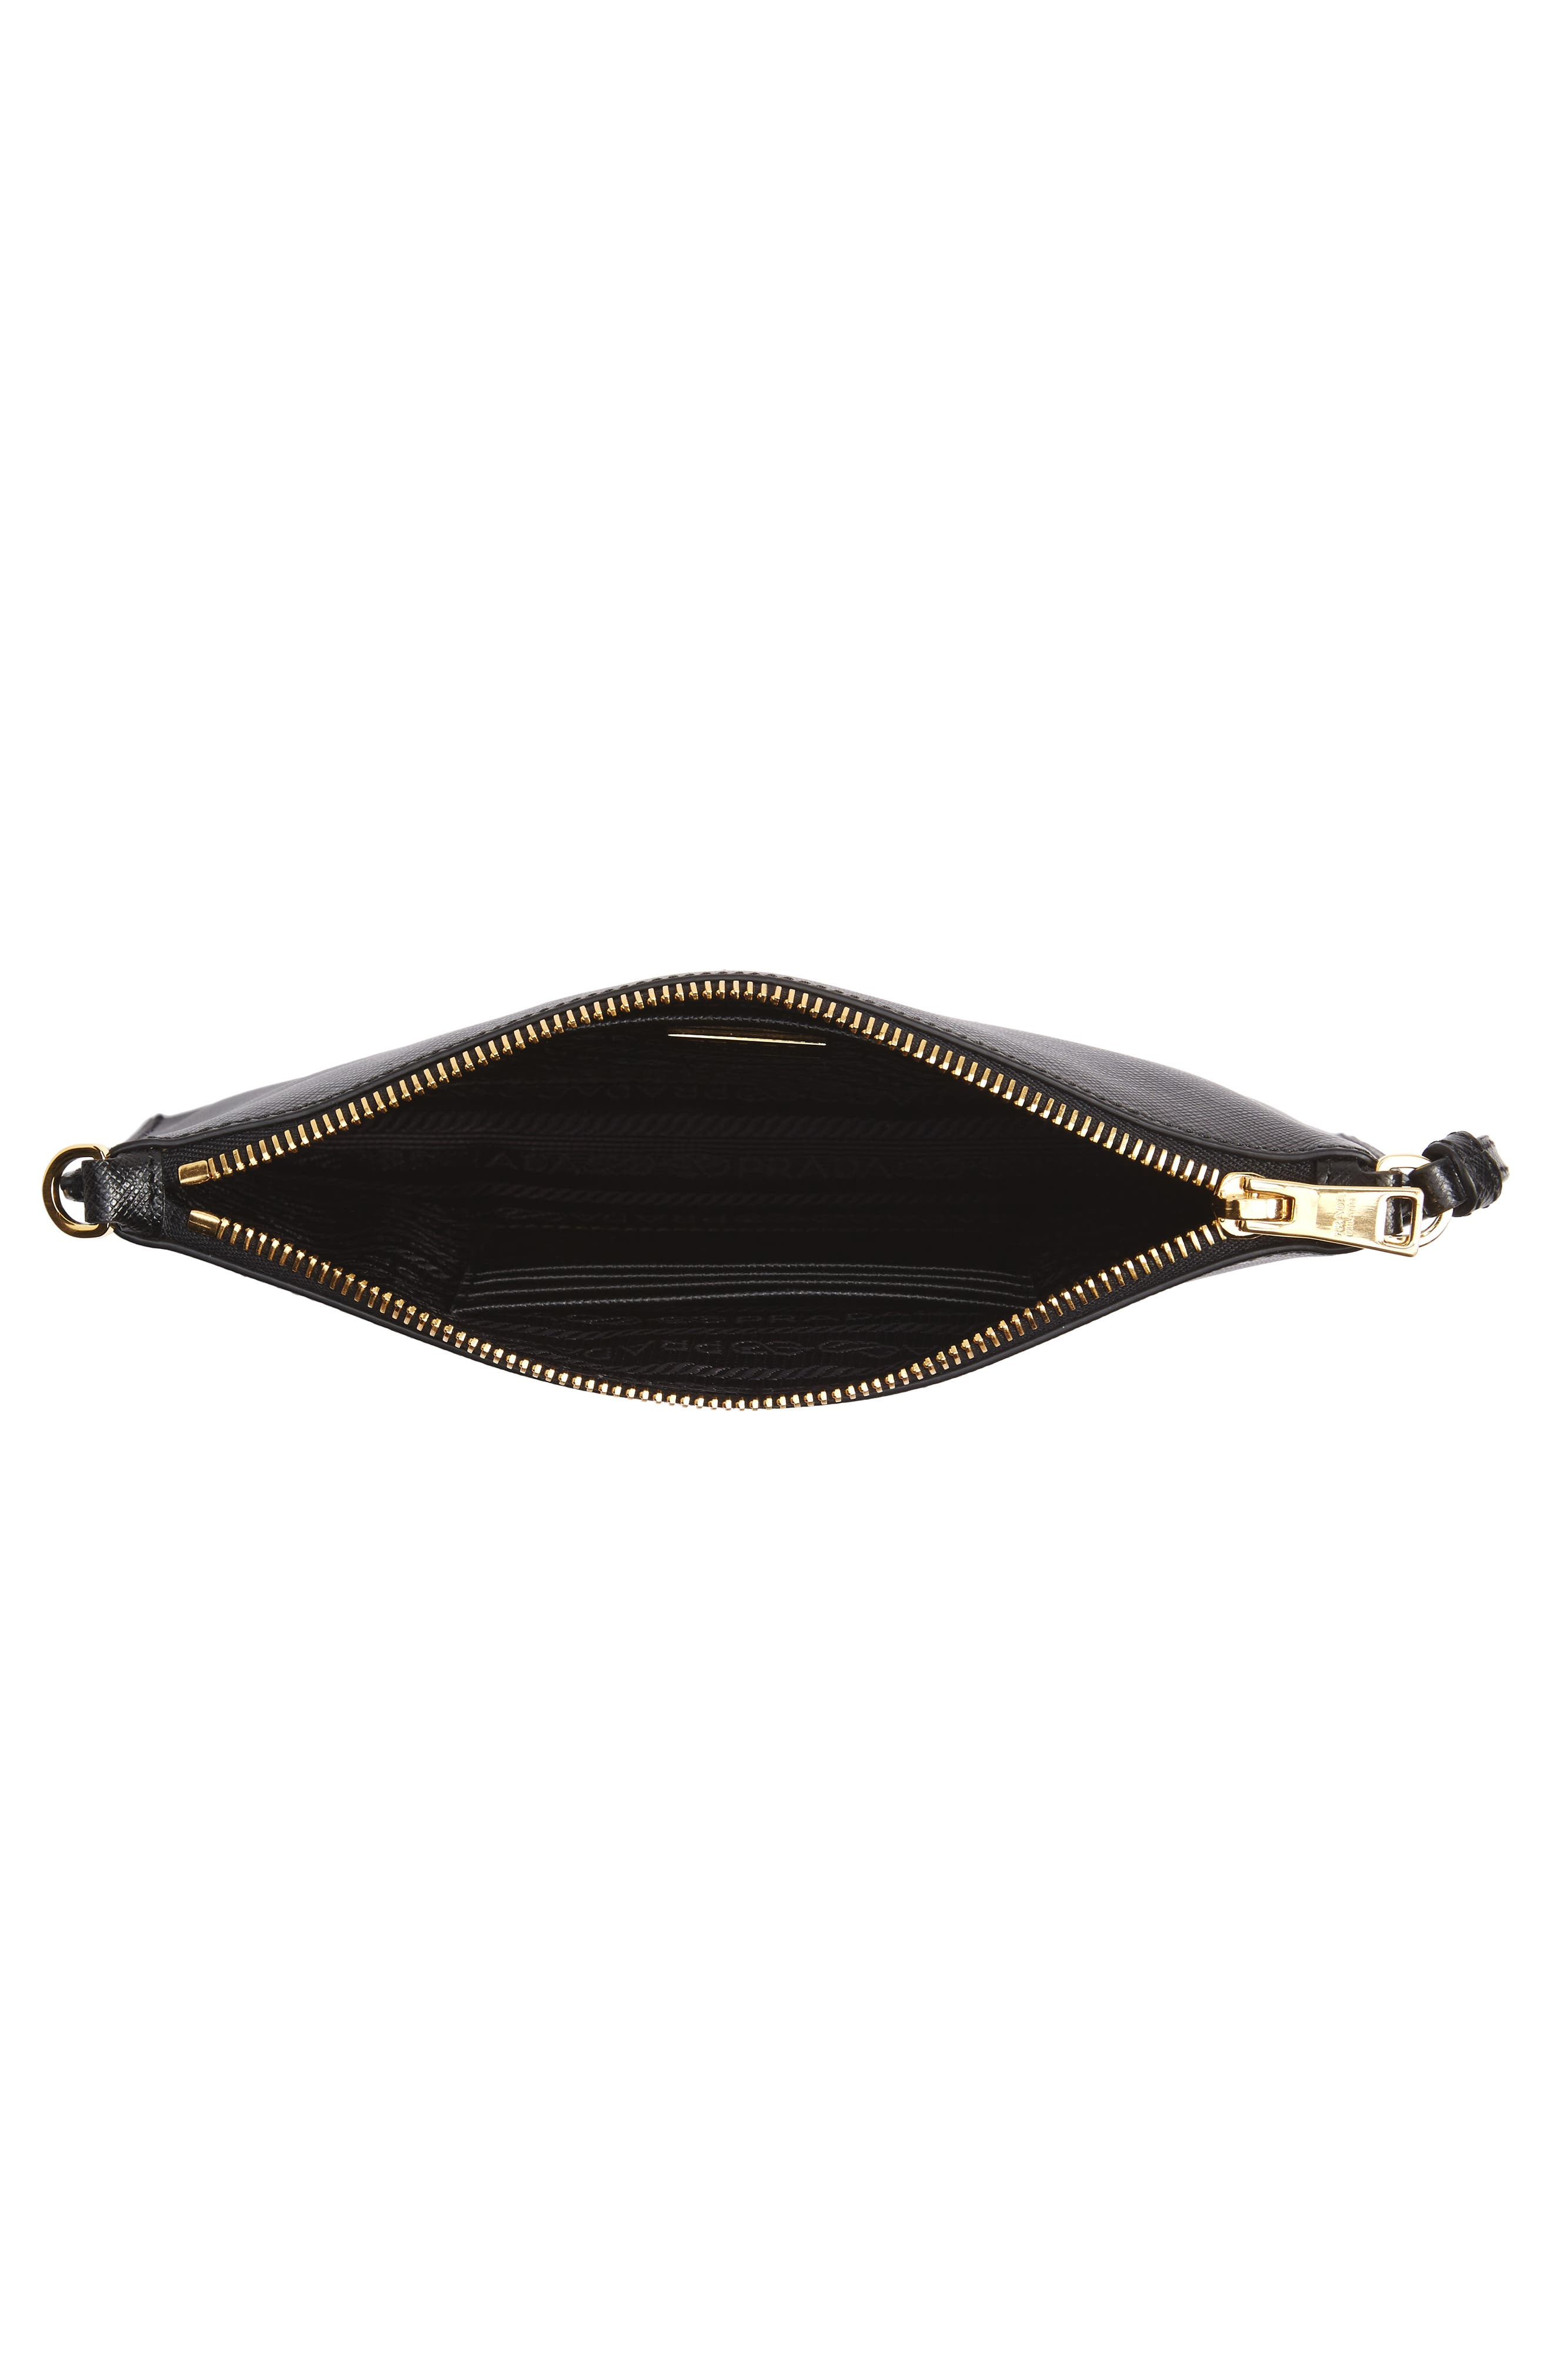 Small Saffiano Leather Shoulder Bag,                             Alternate thumbnail 4, color,                             F0002 NERO